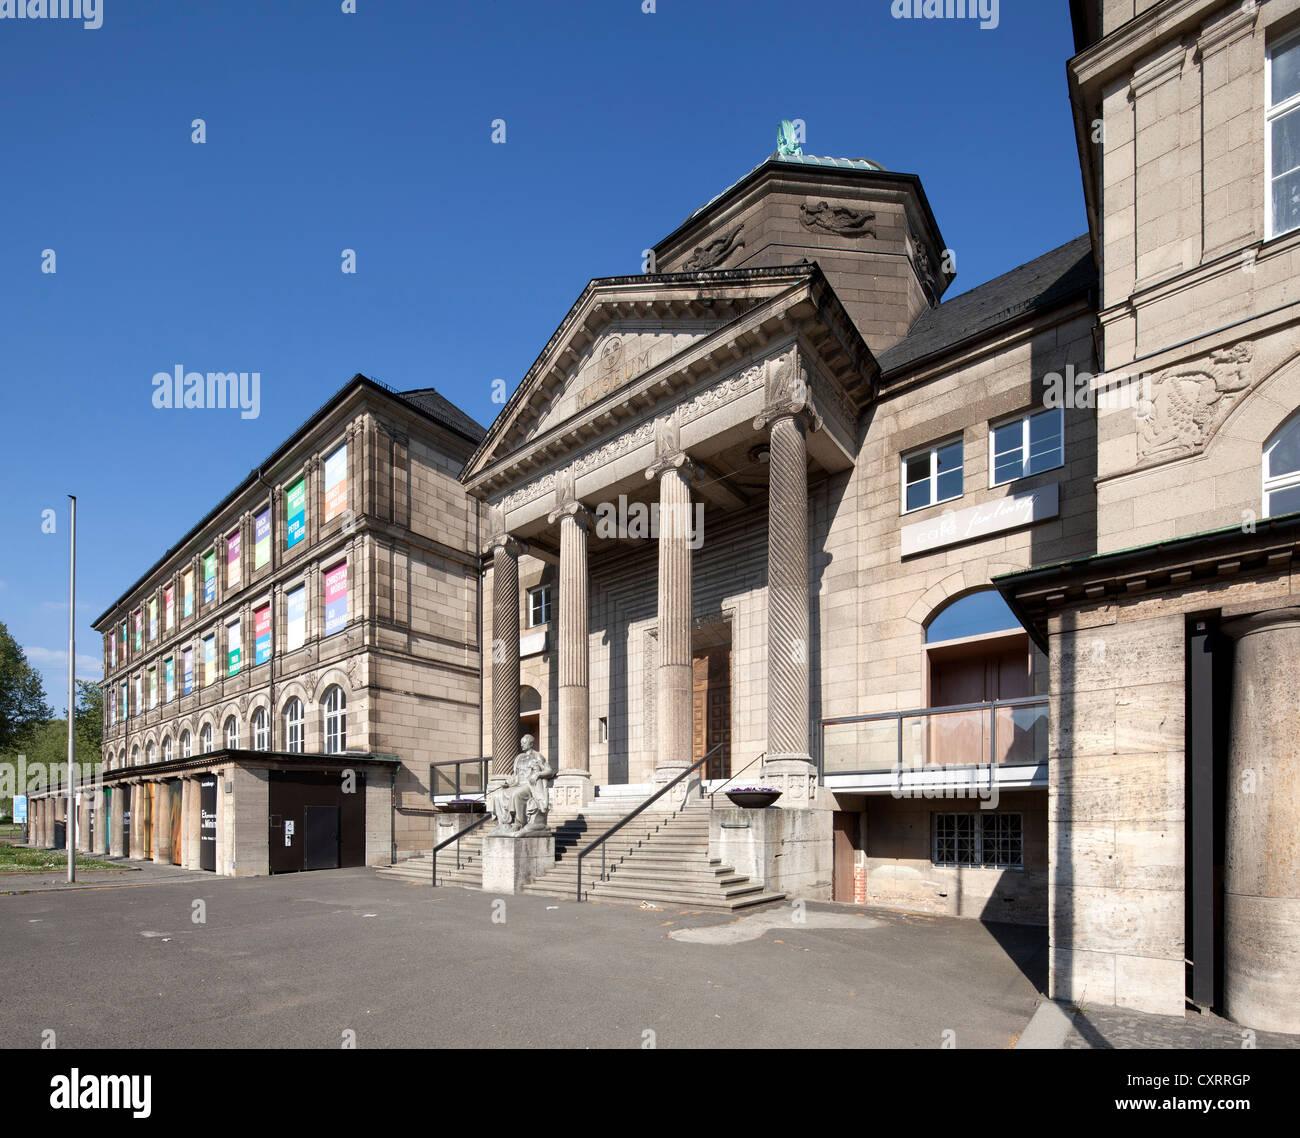 Wiesbaden Museum, Hessian State Museum, Wiesbaden, Hesse, Germany, Europe, PublicGround - Stock Image